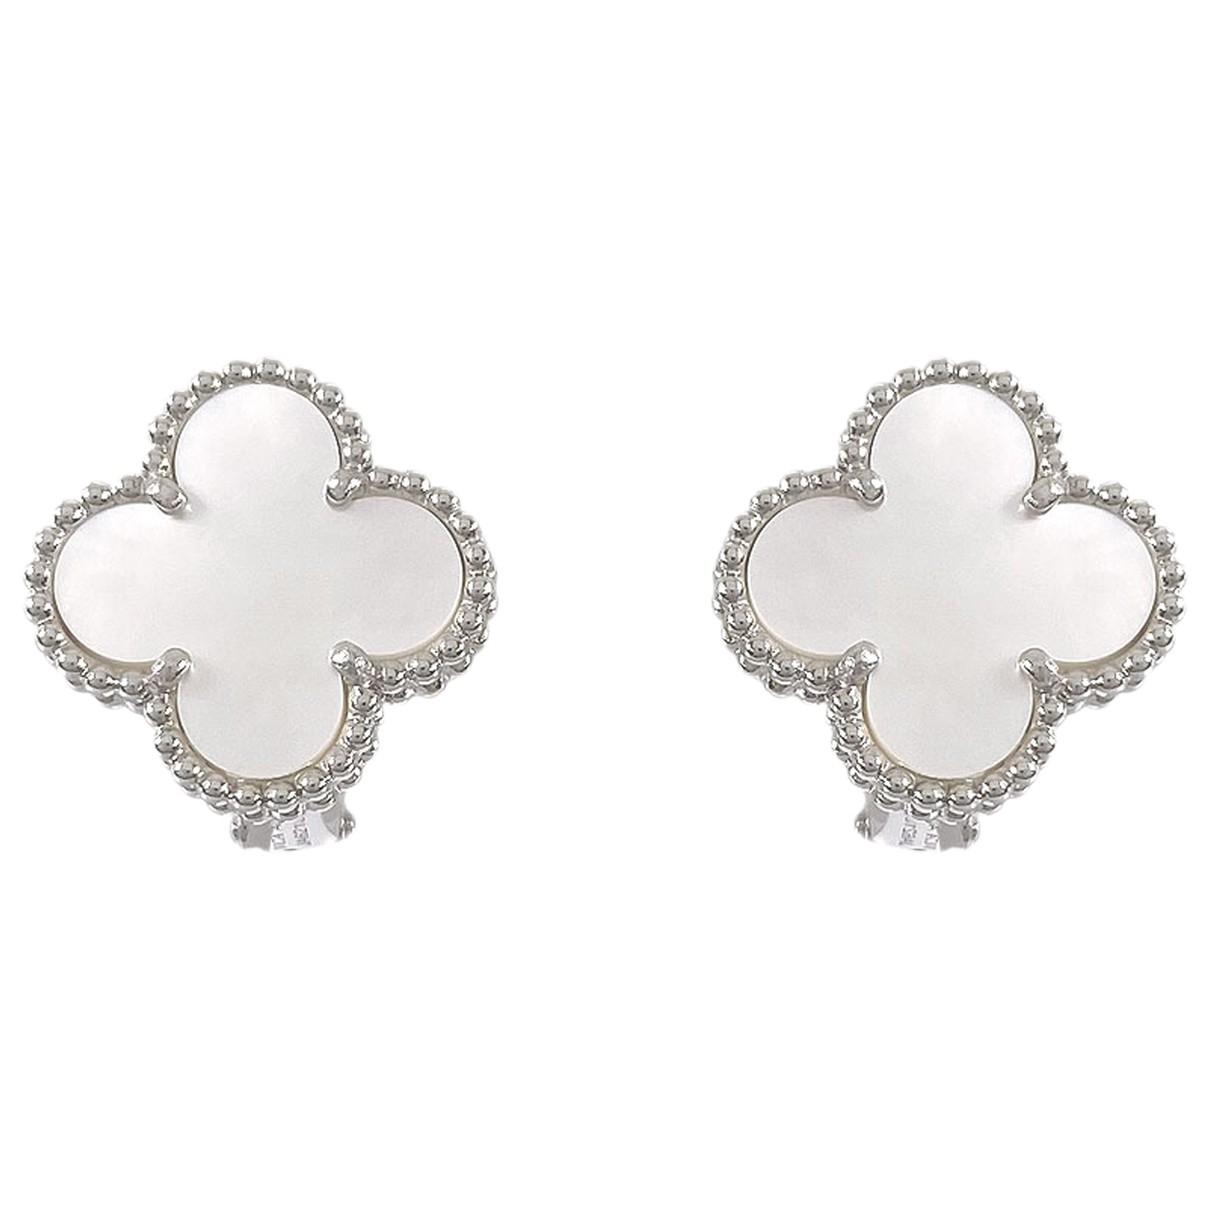 Van Cleef & Arpels Vintage Alhambra OhrRing in  Silber Weissgold